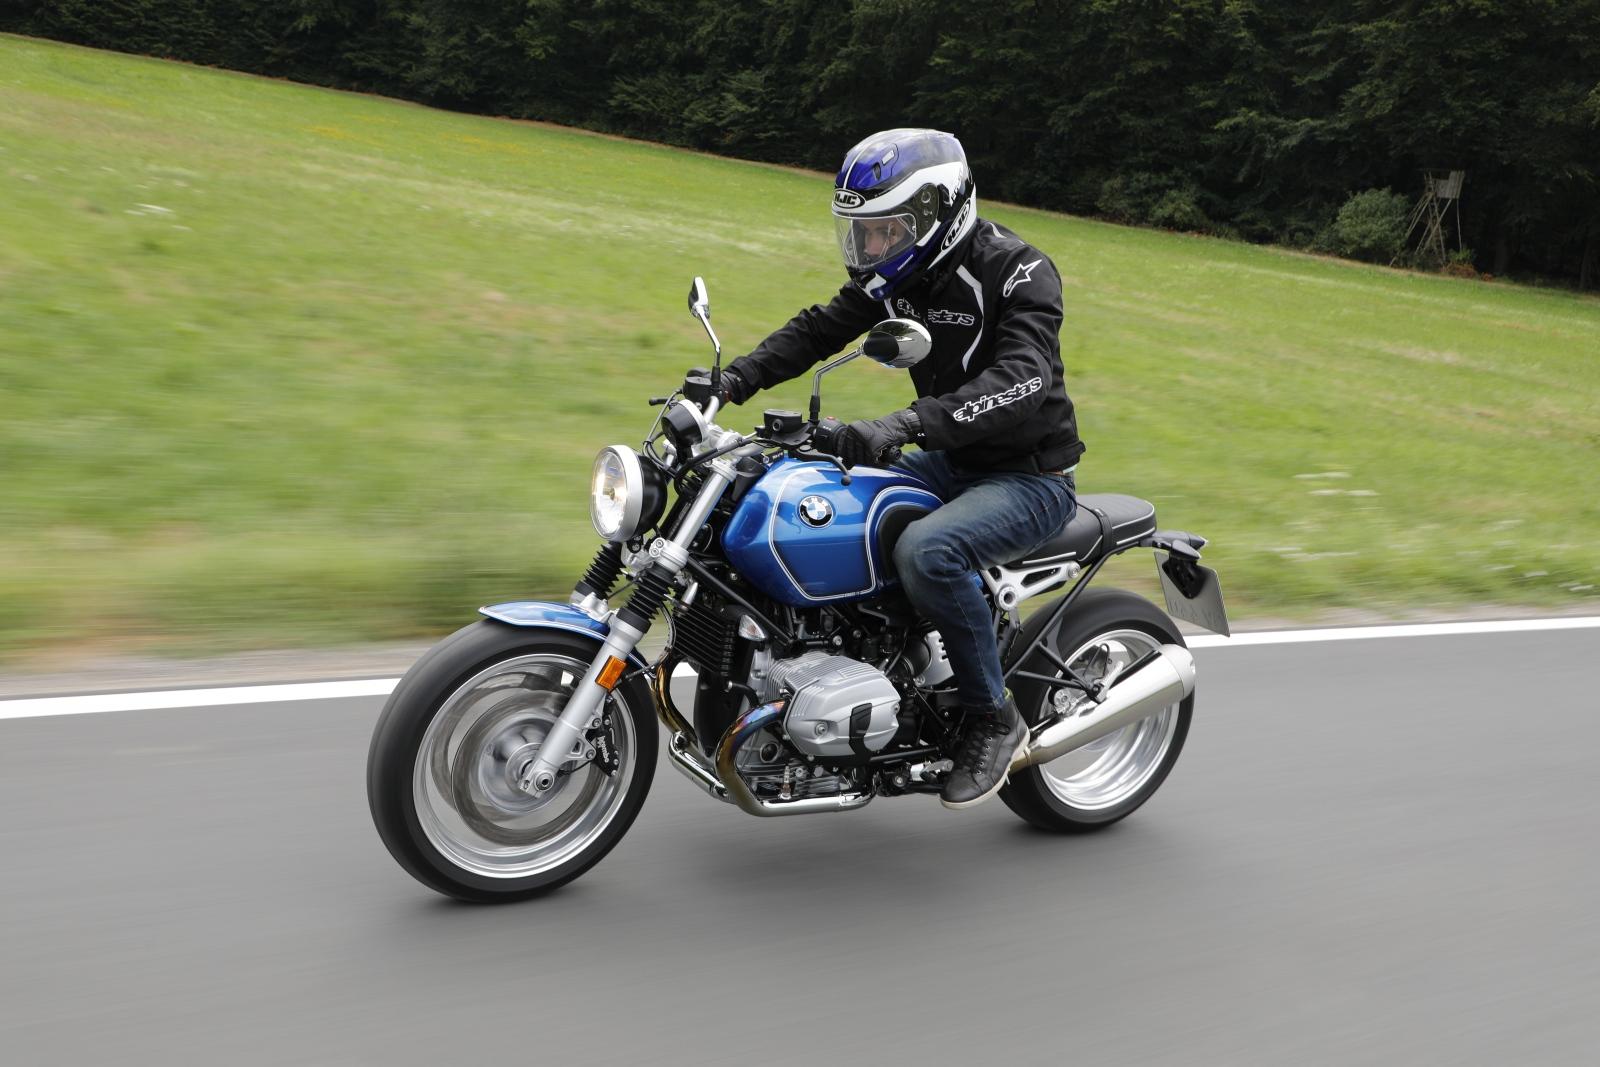 BMW R nineT /5 2019 - Motortest MotorRAI.nl